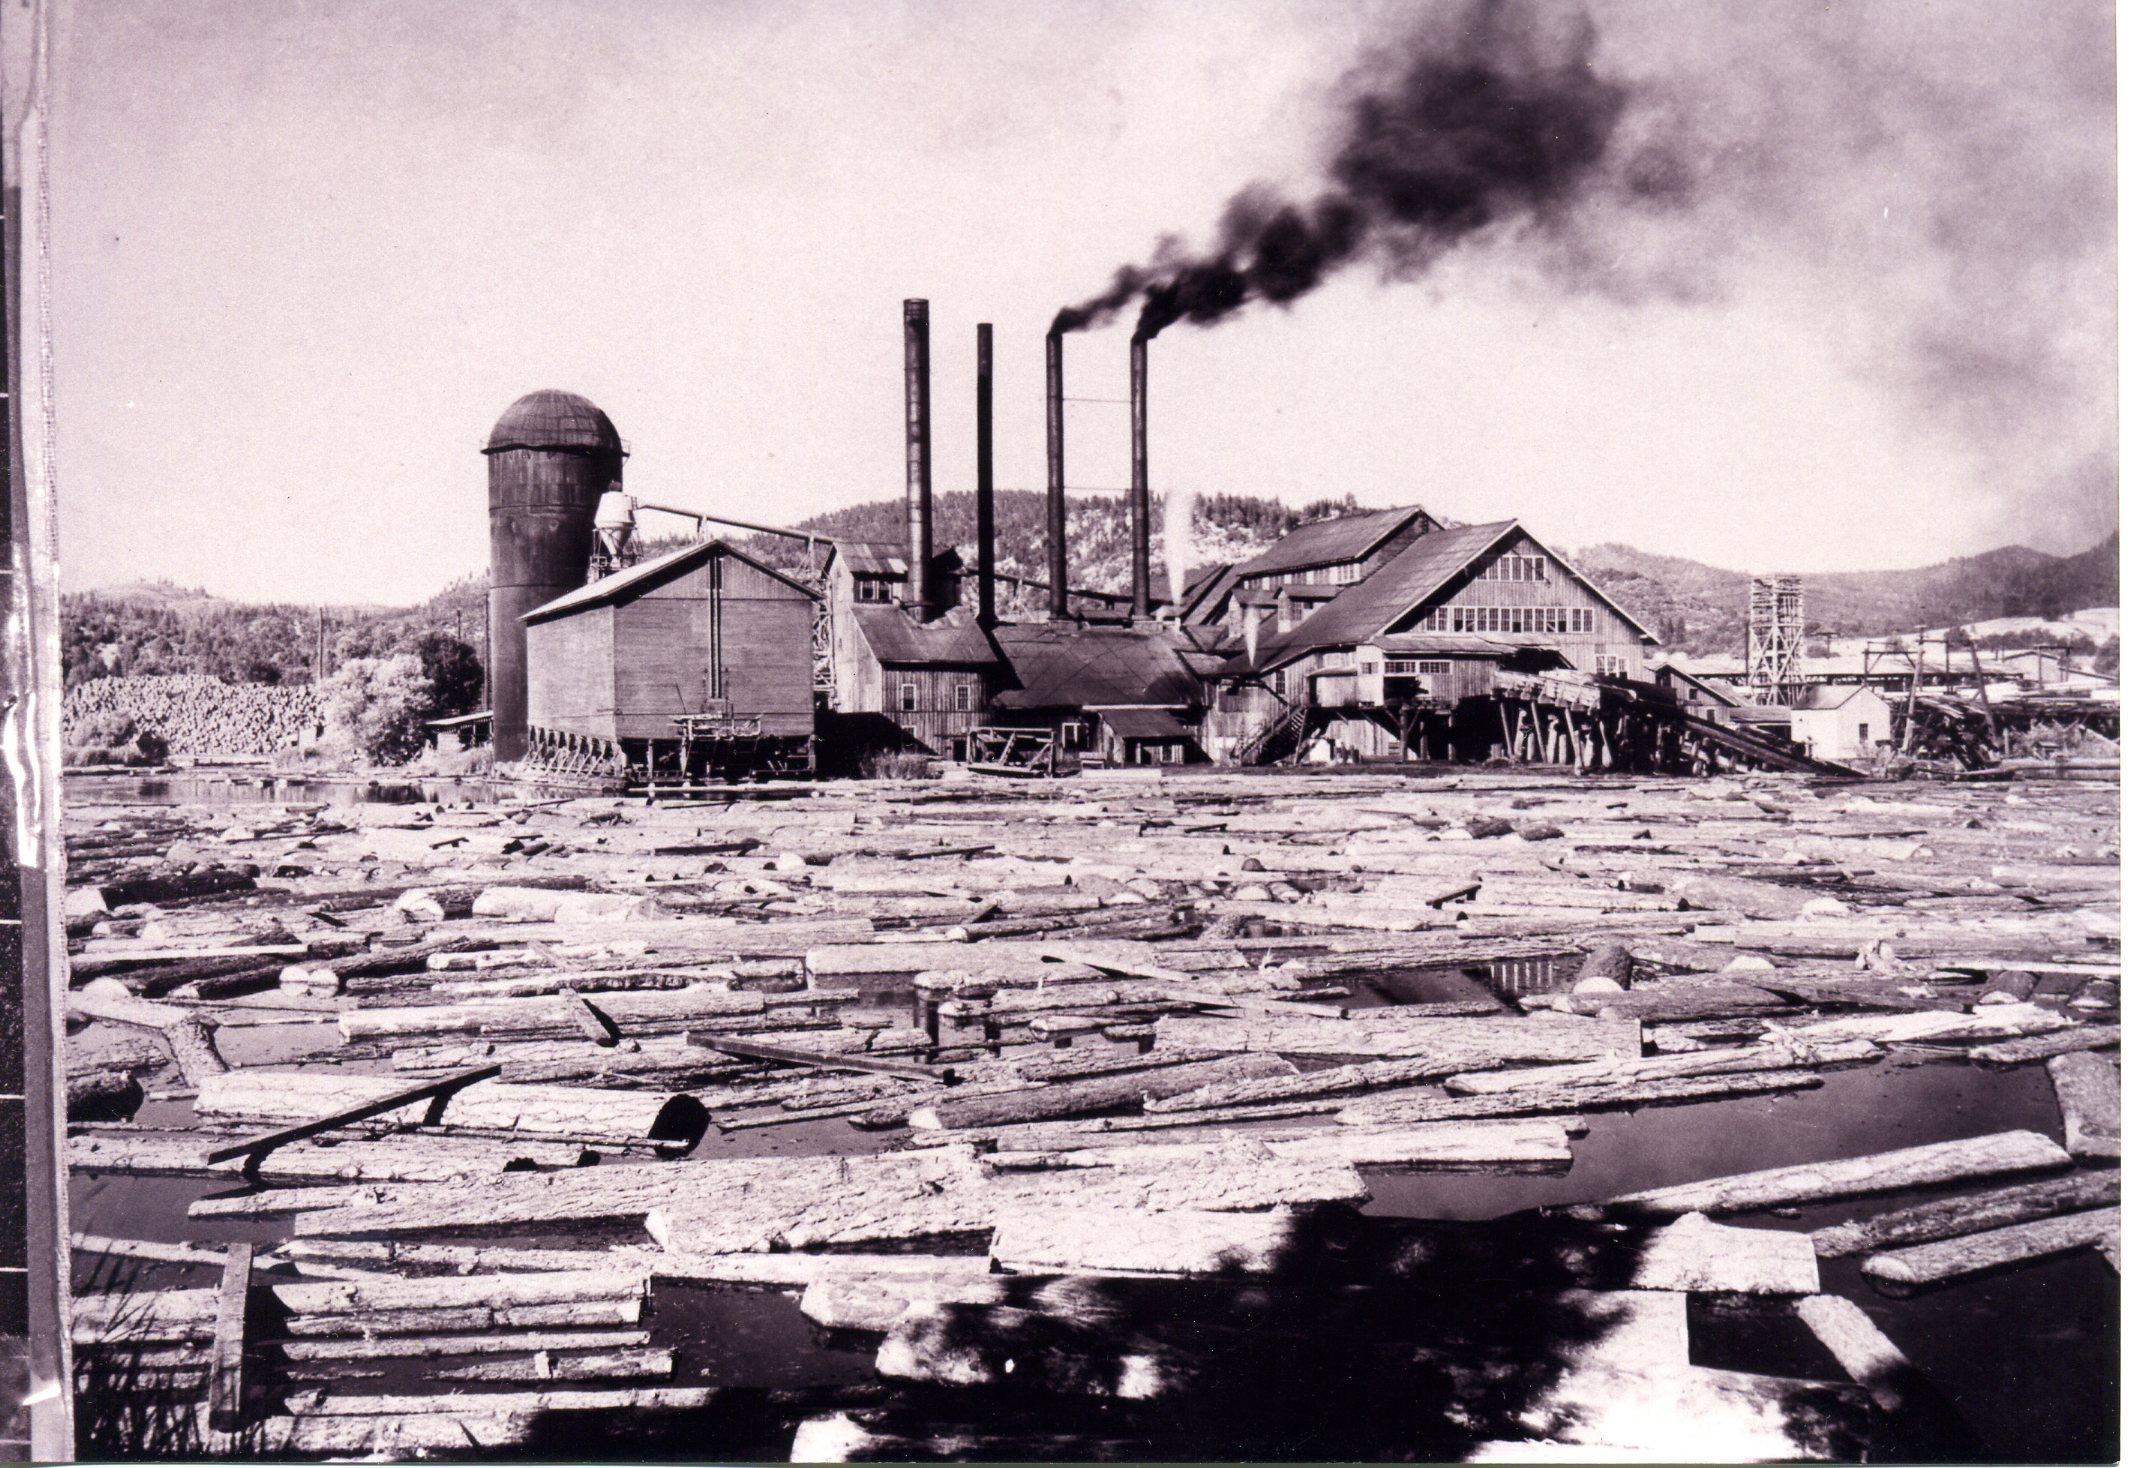 West Side Lumber Company Sierra Nevada Logging Museum